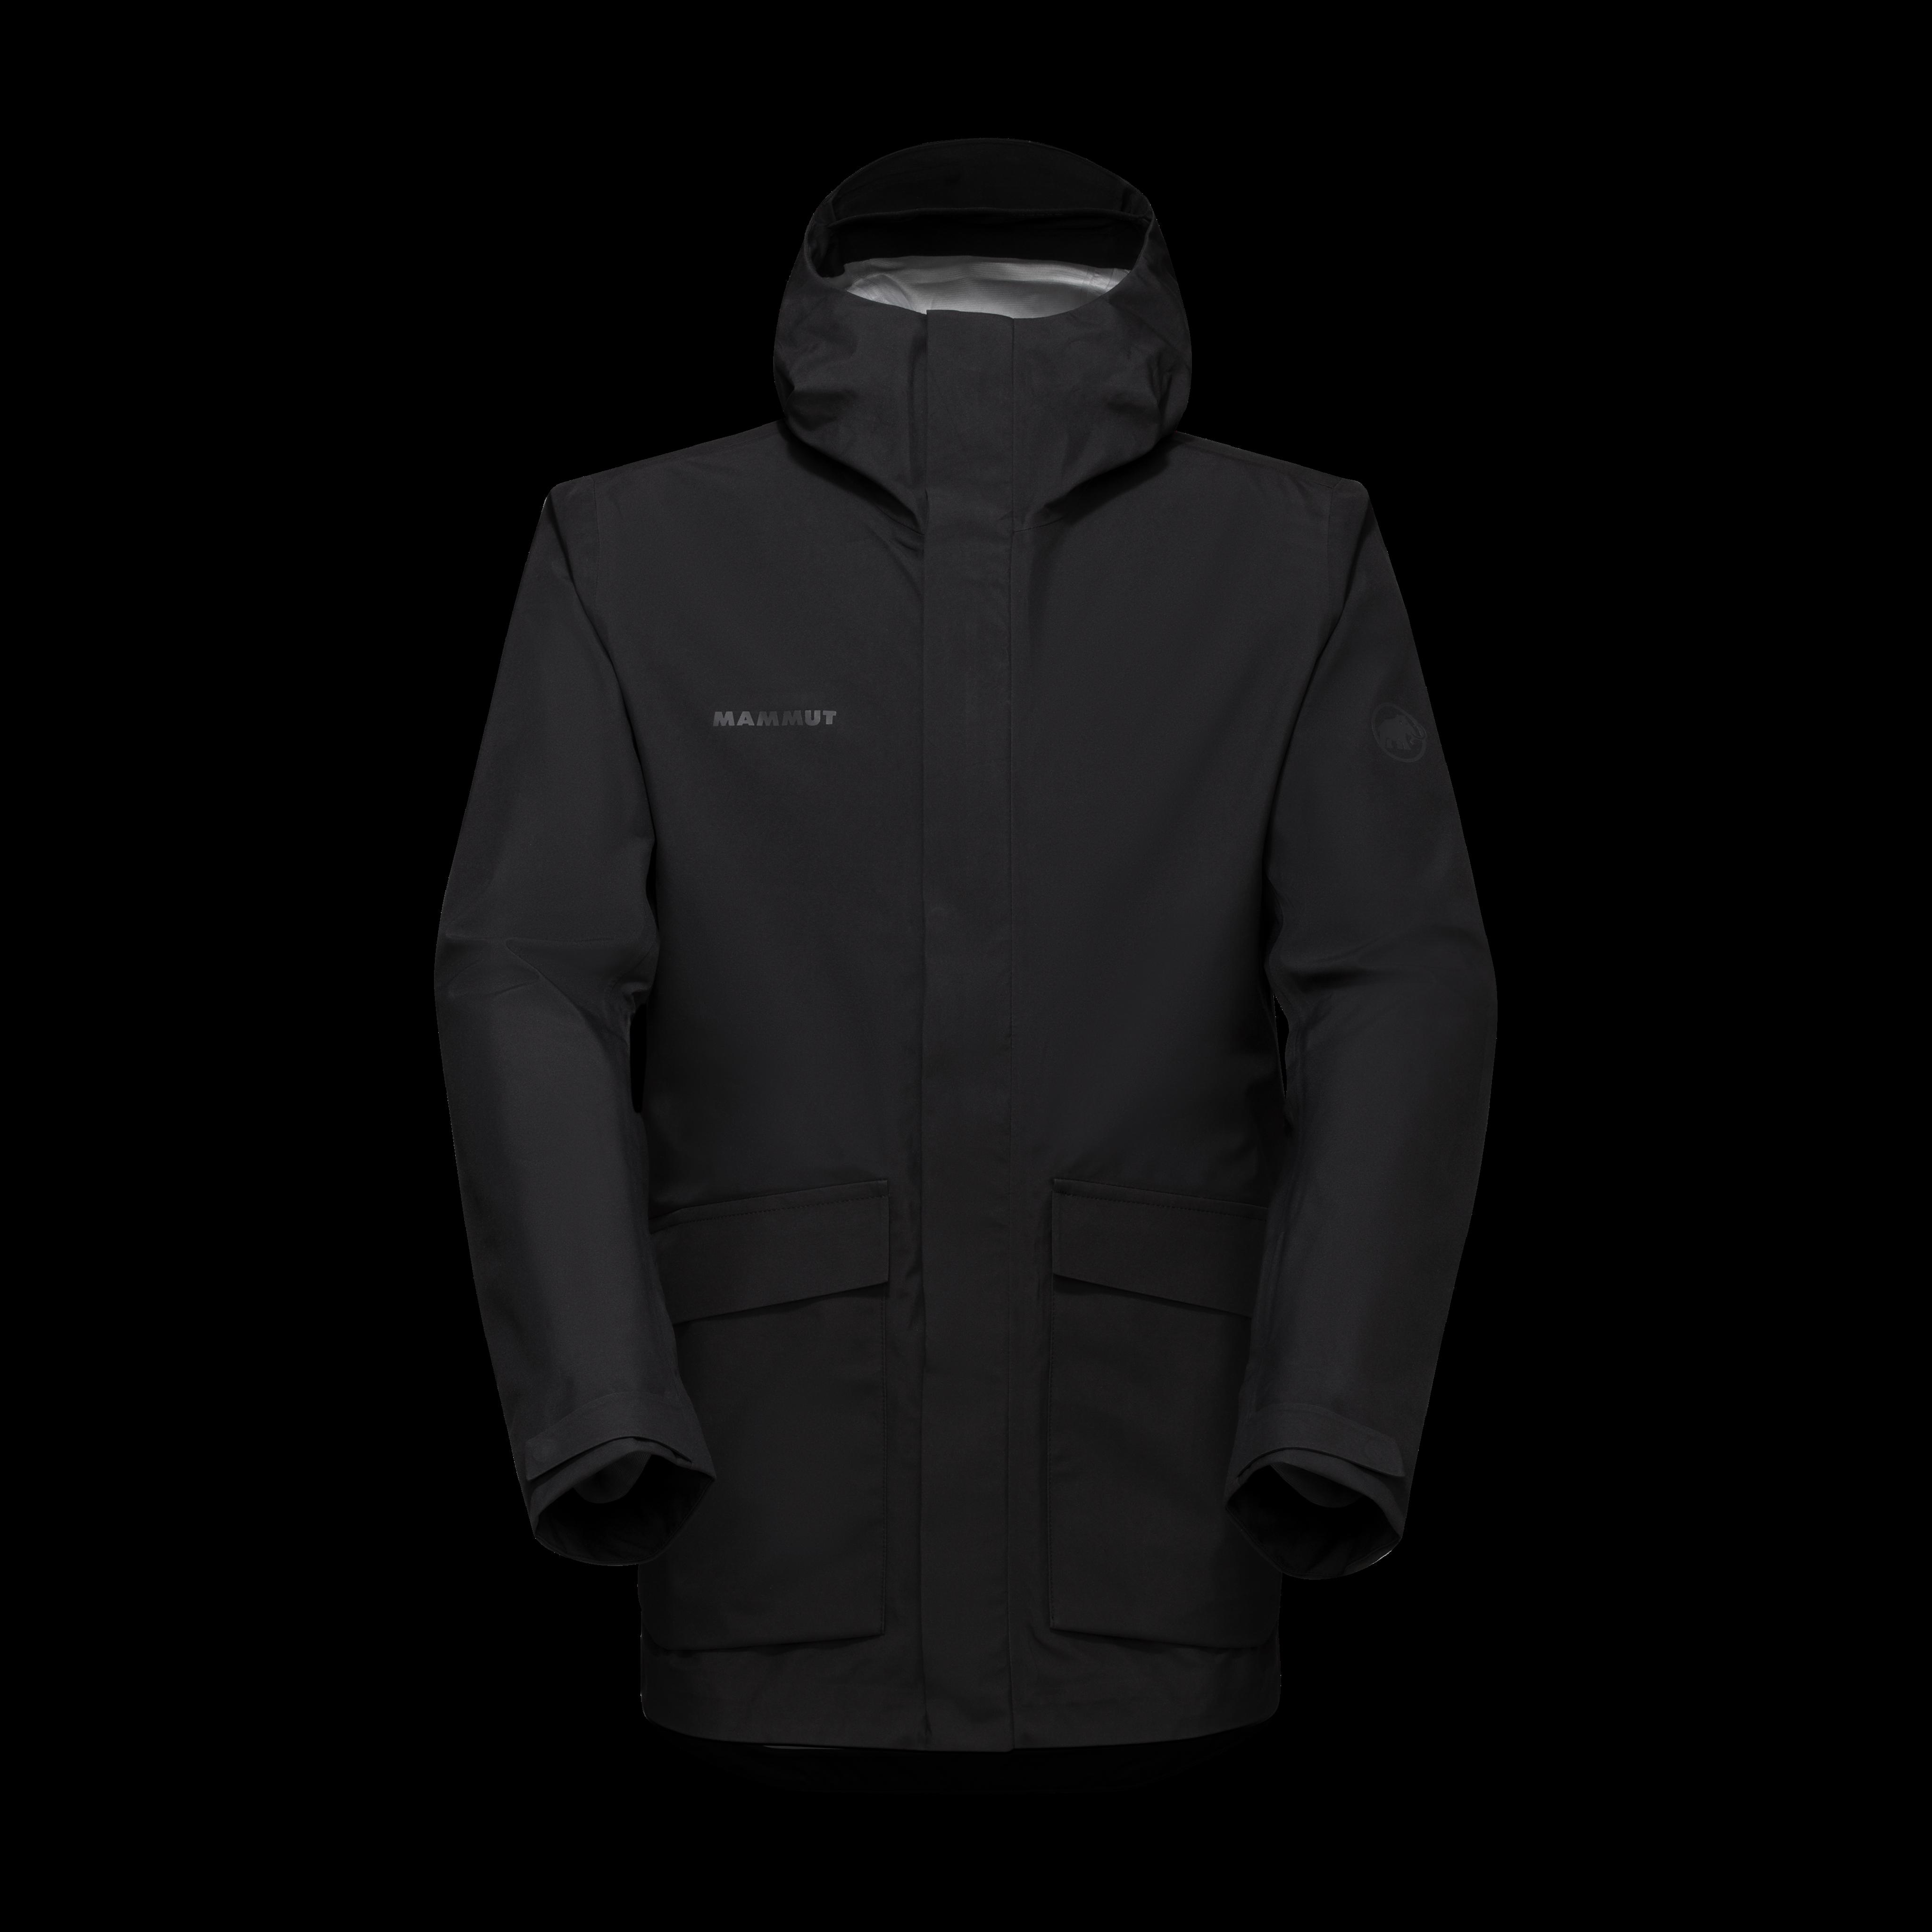 Mammut 3L HS Hooded Jacket Men - black, L thumbnail